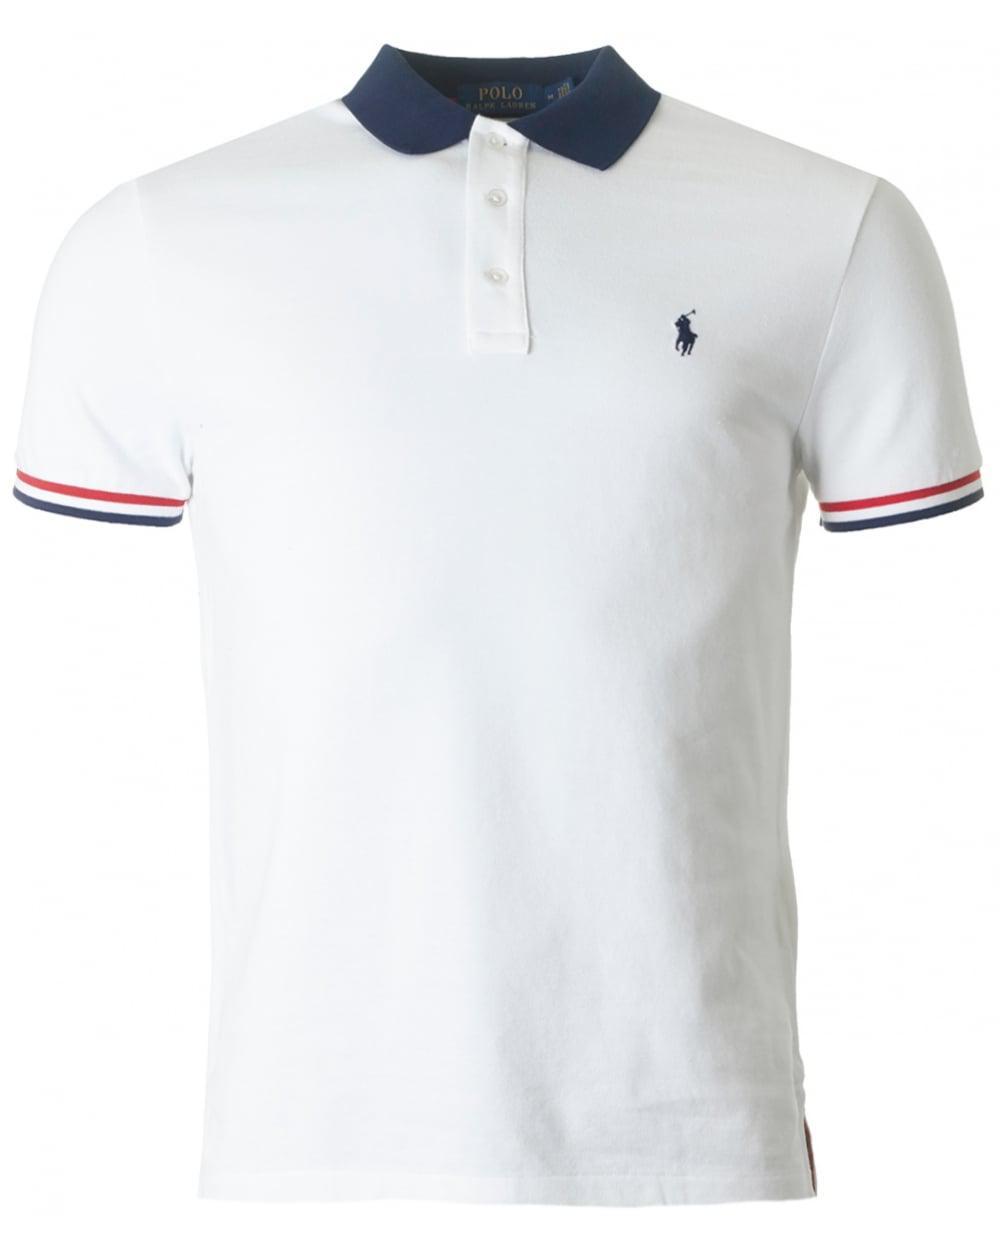 Polo Ralph Lauren Collar Shirts Cheap